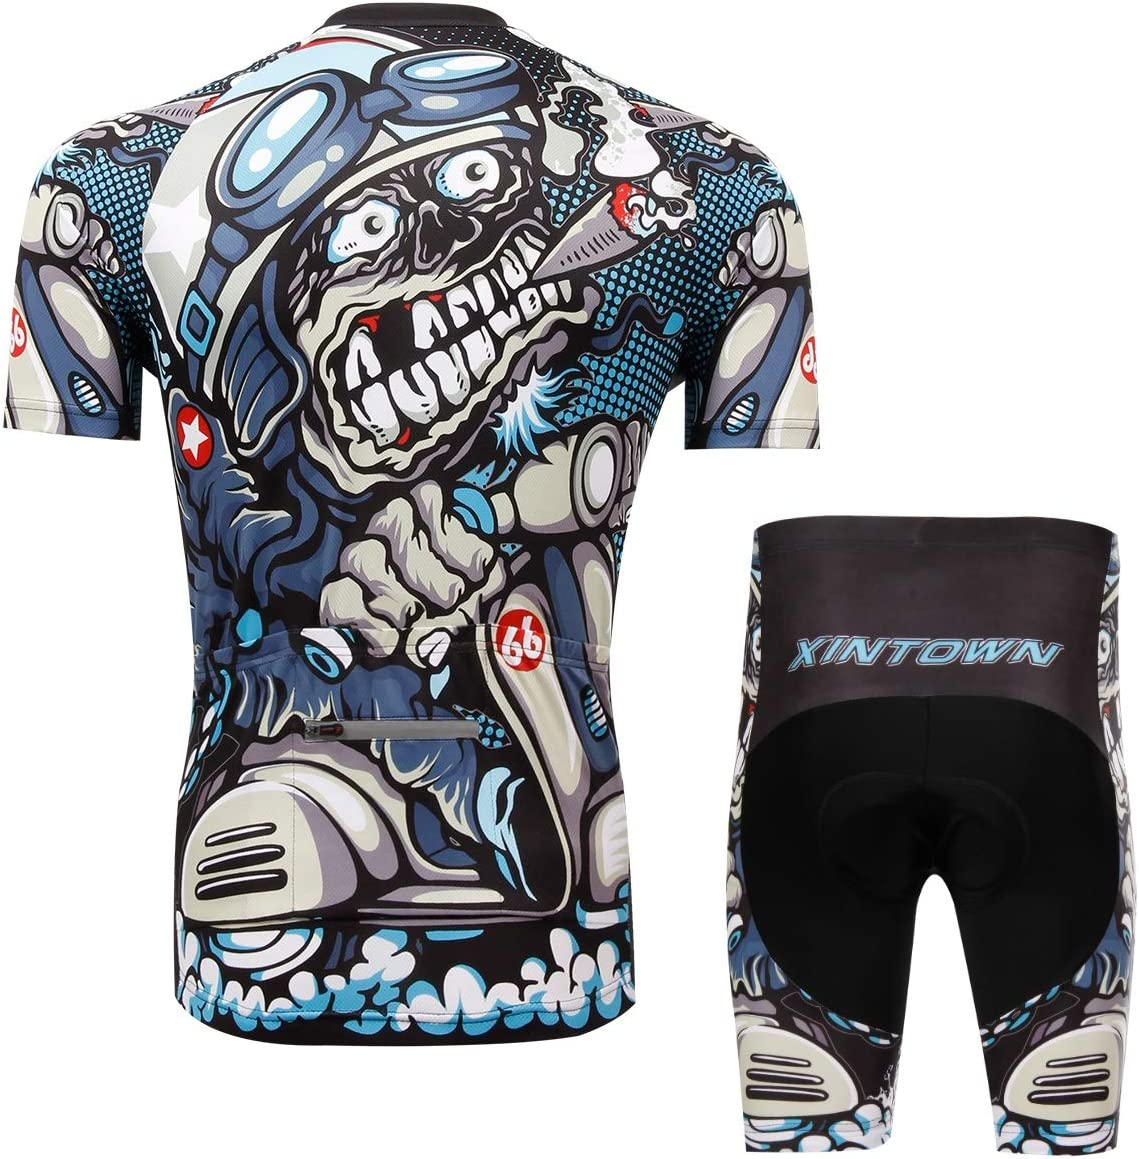 Unkoo Interesting Cycling Jersey Skull Sublimation Printing Polyester Summer Quick Dry Bike Men Plus Size Pro Short Sleeve Clothes Mens Half Top Racing Team Biking Bib Shorts Set